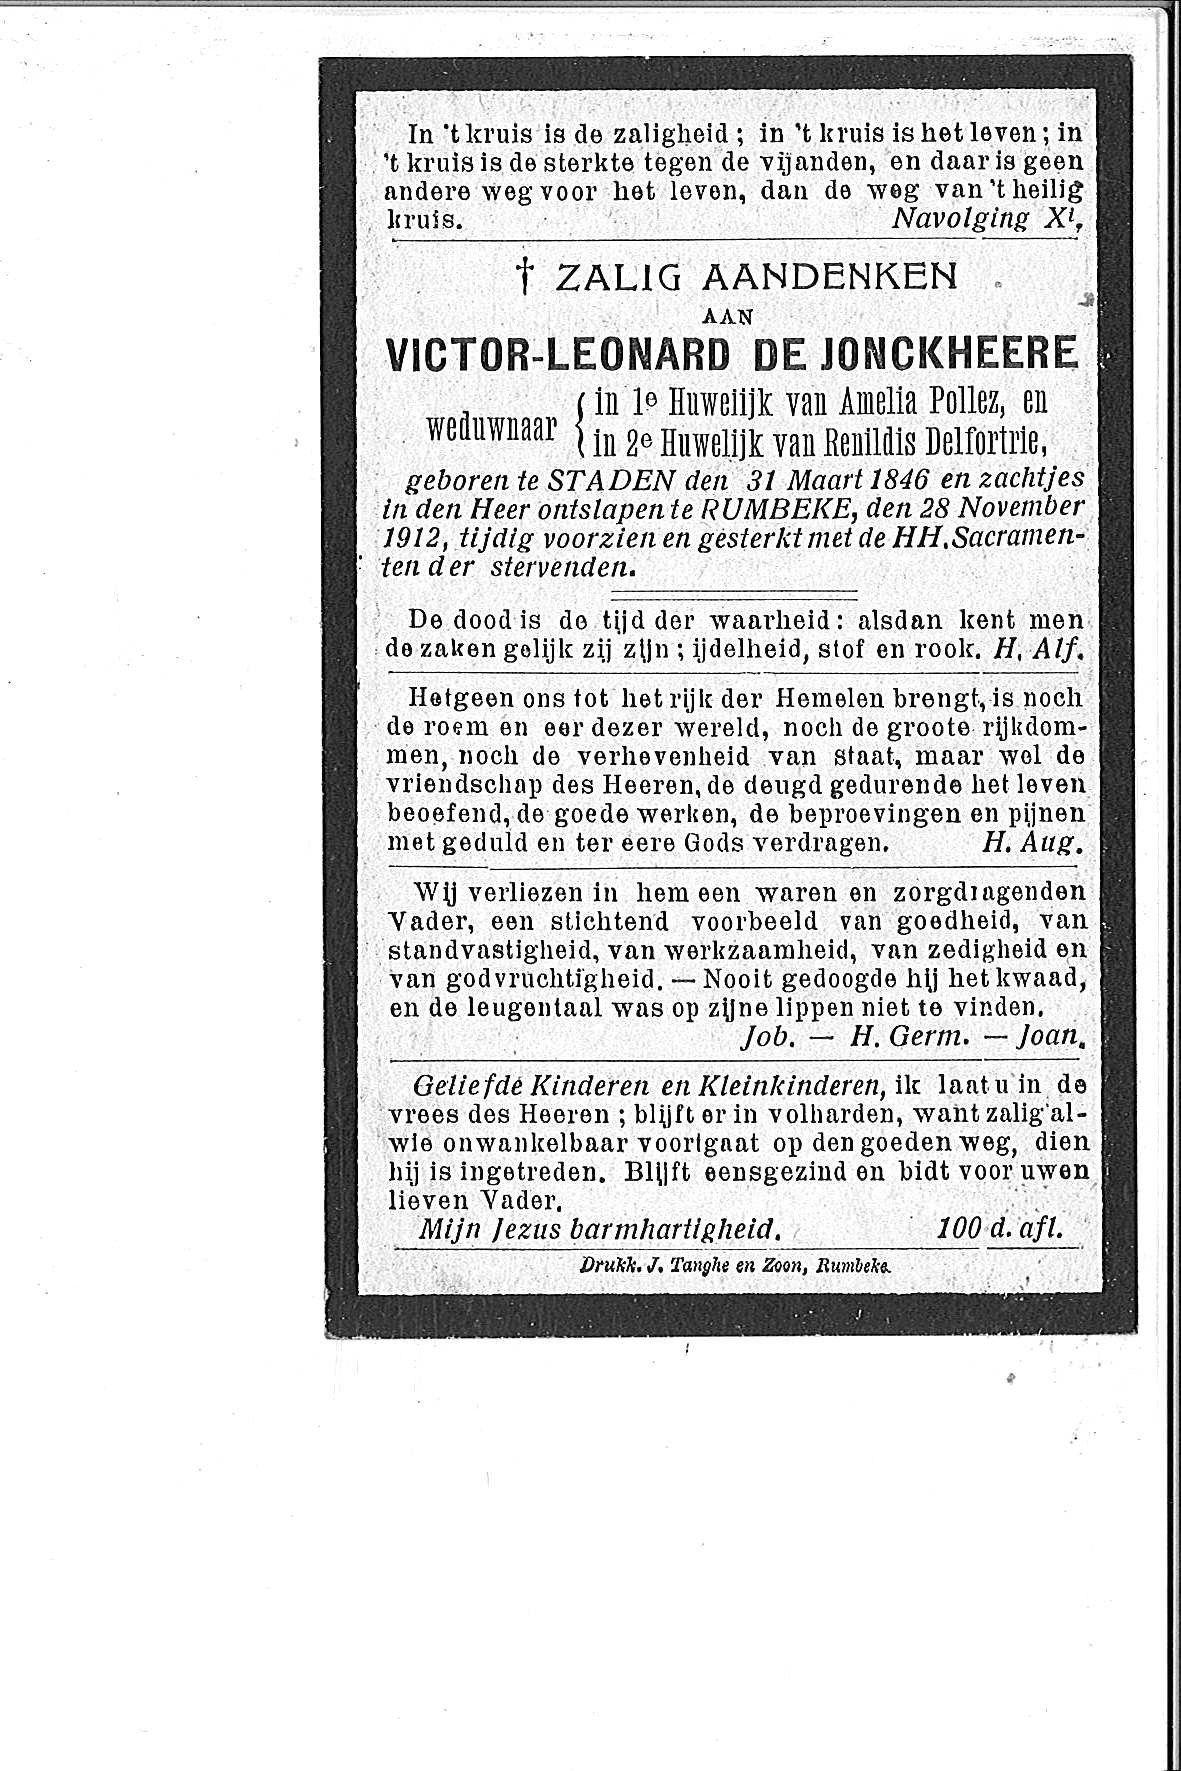 Victor-Leonard(1912)20150429090148_00042.jpg